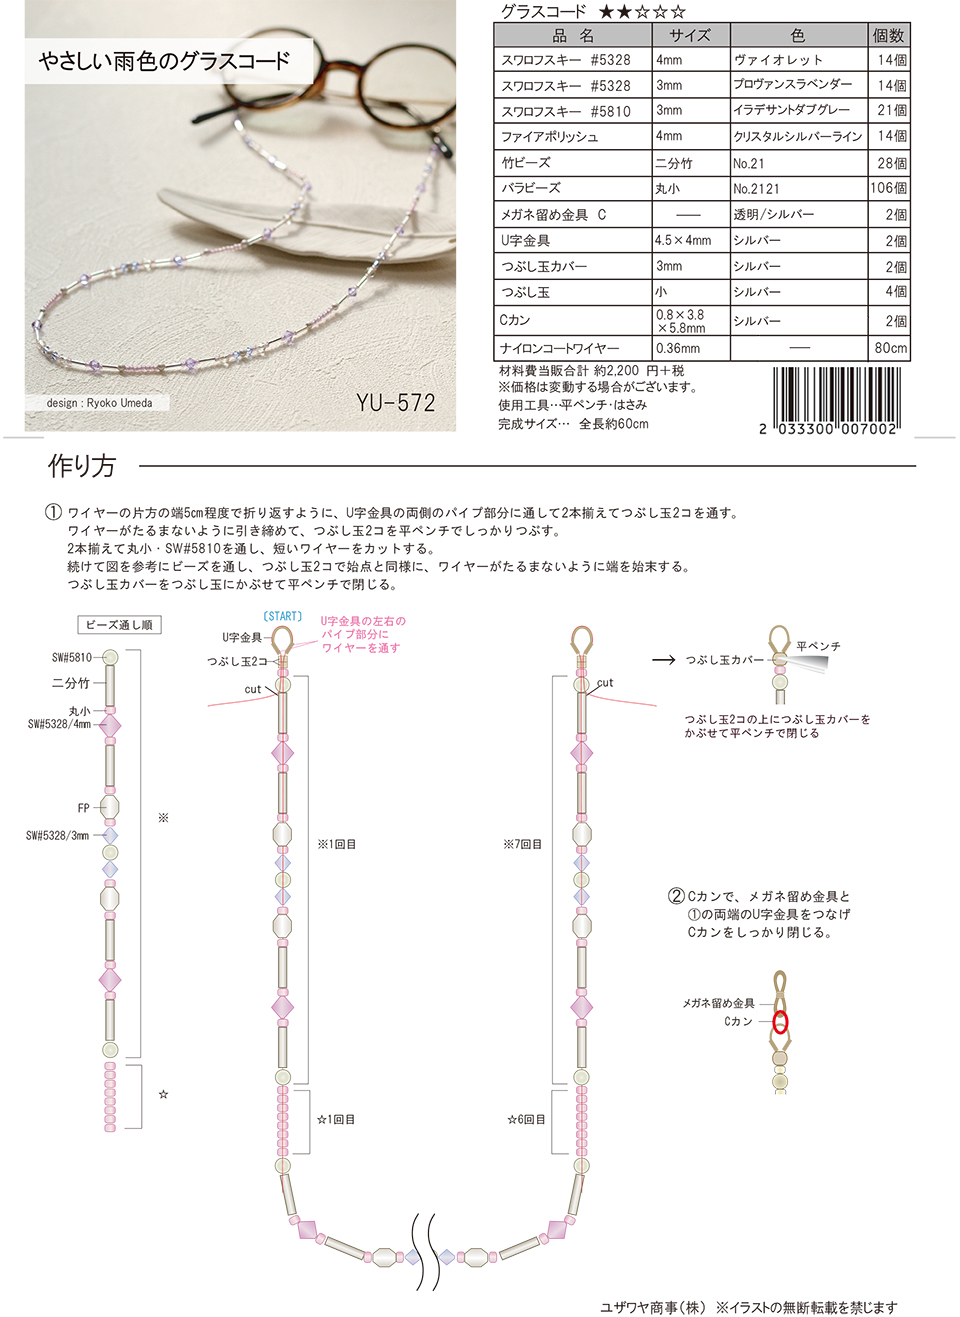 YU-572やさしい雨色のグラスコード_1.jpg